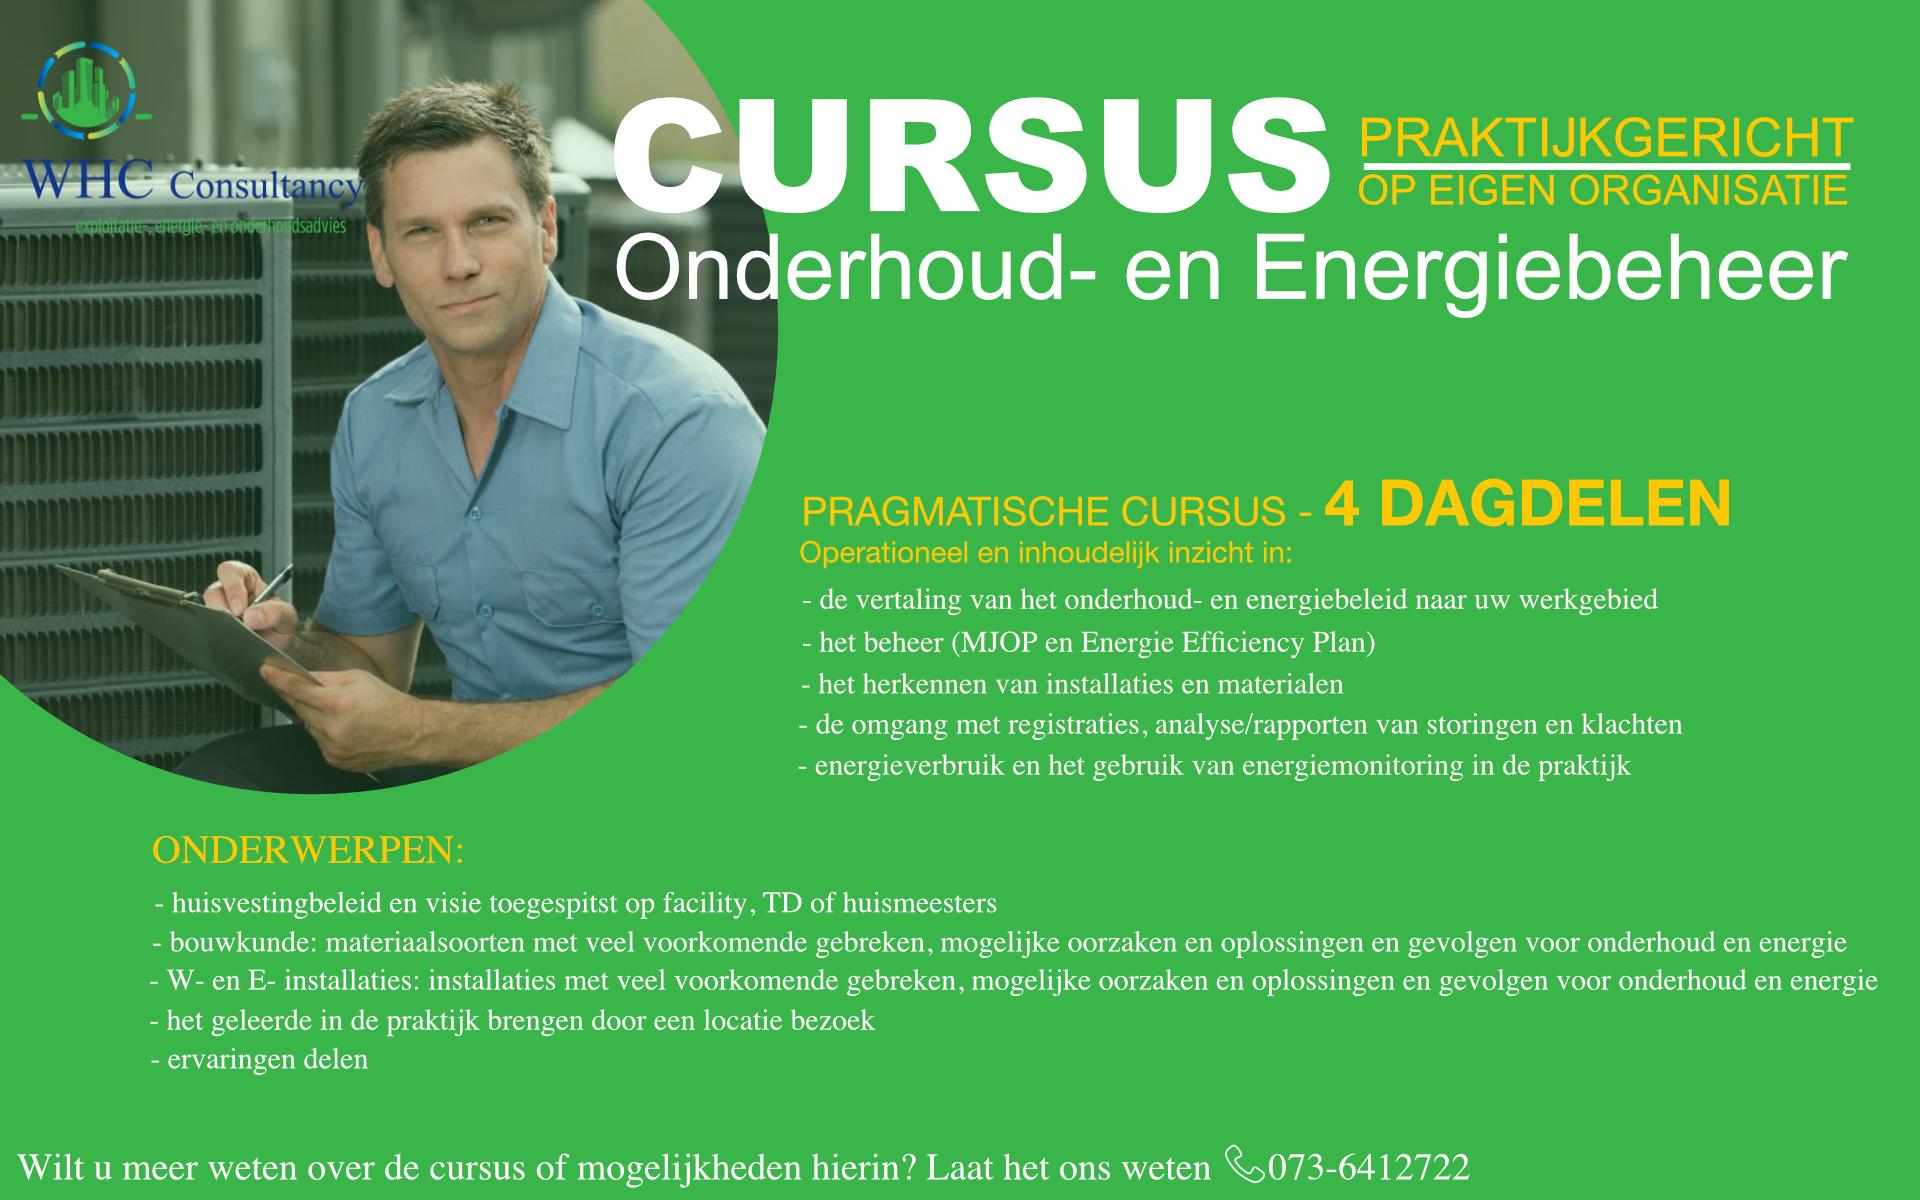 Cursus Onderhoud- en Energiebeheer